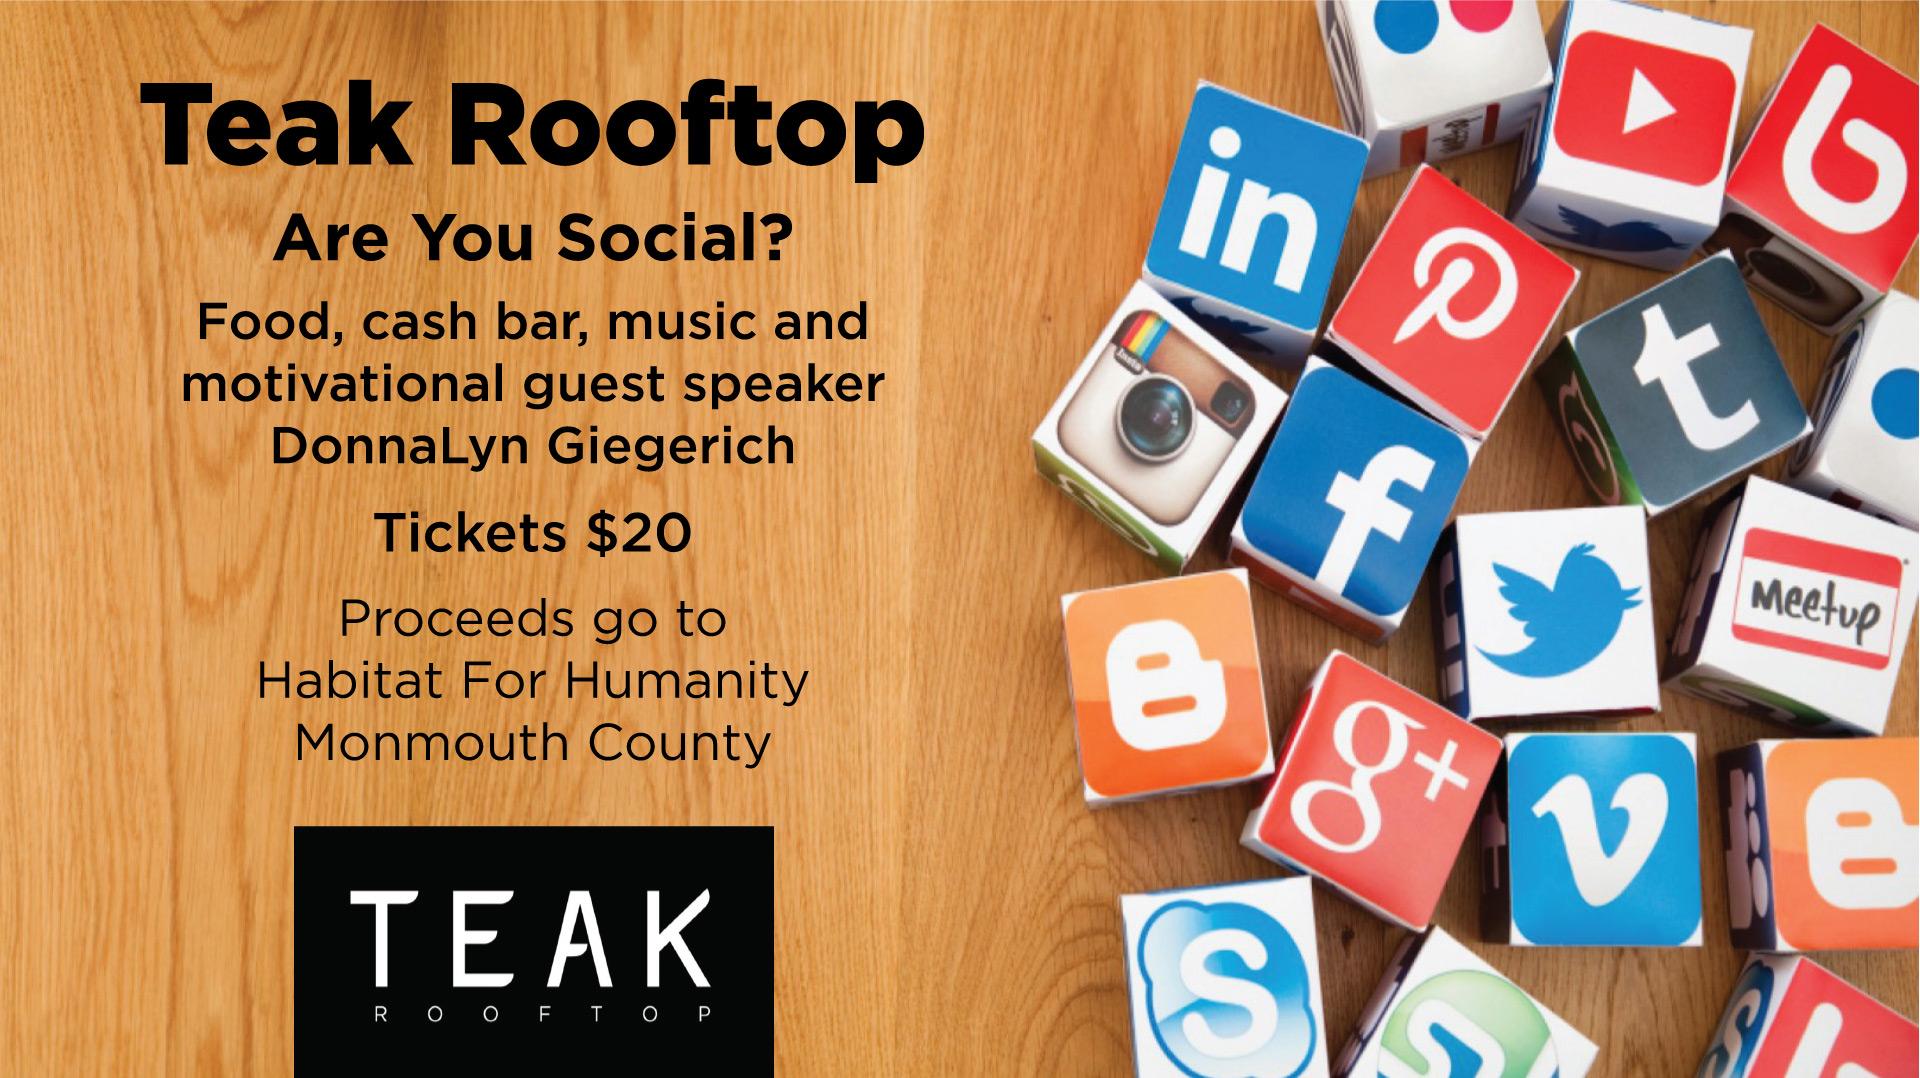 Teak Rooftop at Red Bank, NJ